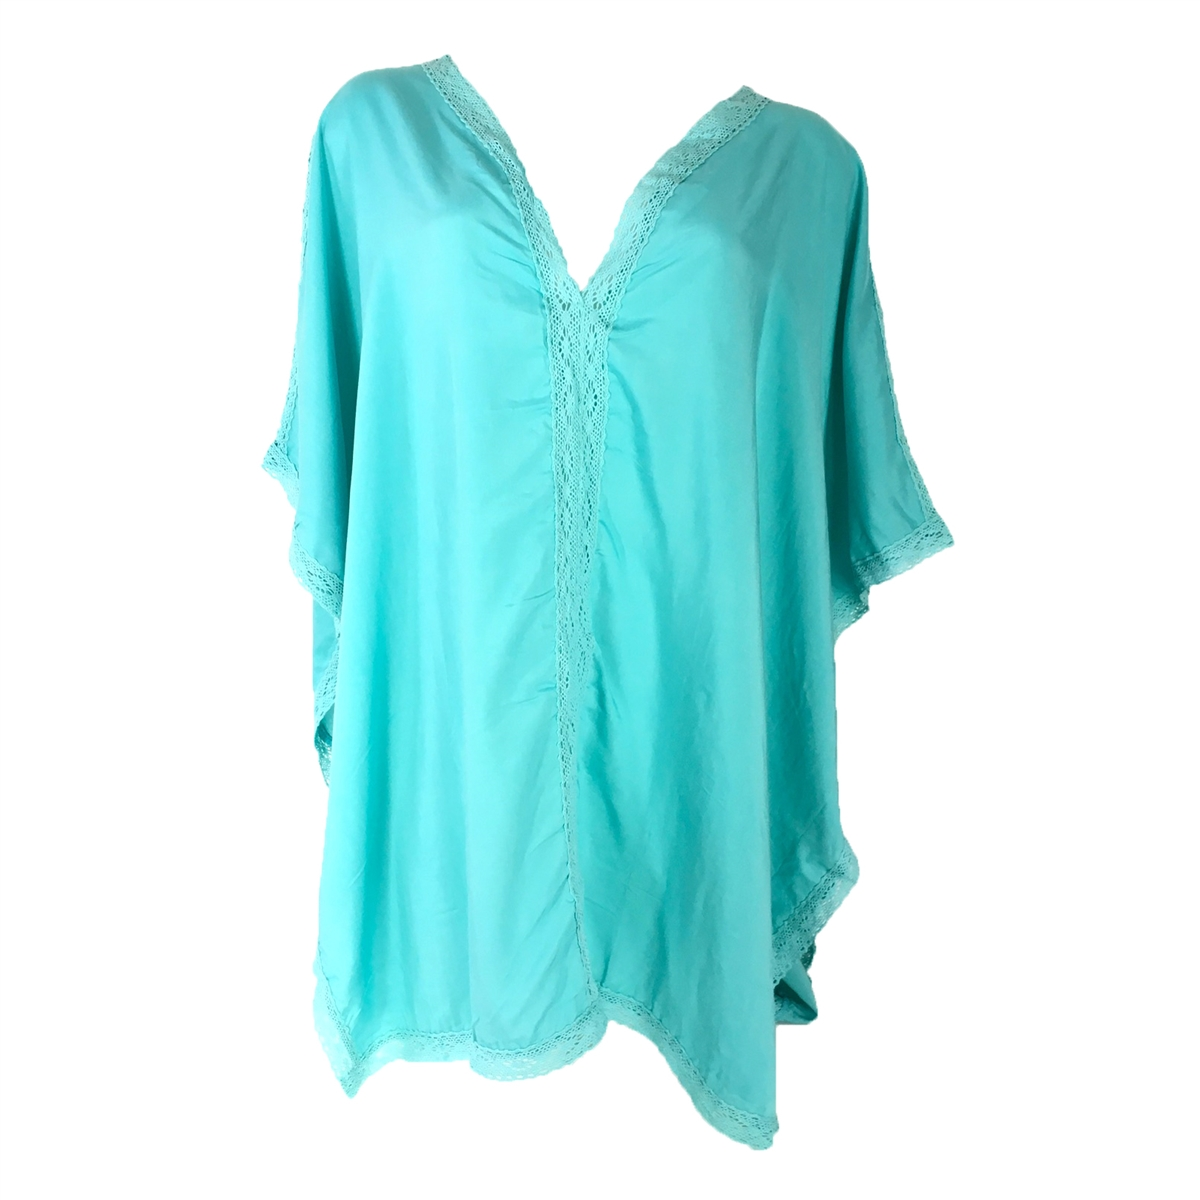 f5f5b4d678ed5 Blue Island Lace Trim Caftan Swim Tunic Cover Up